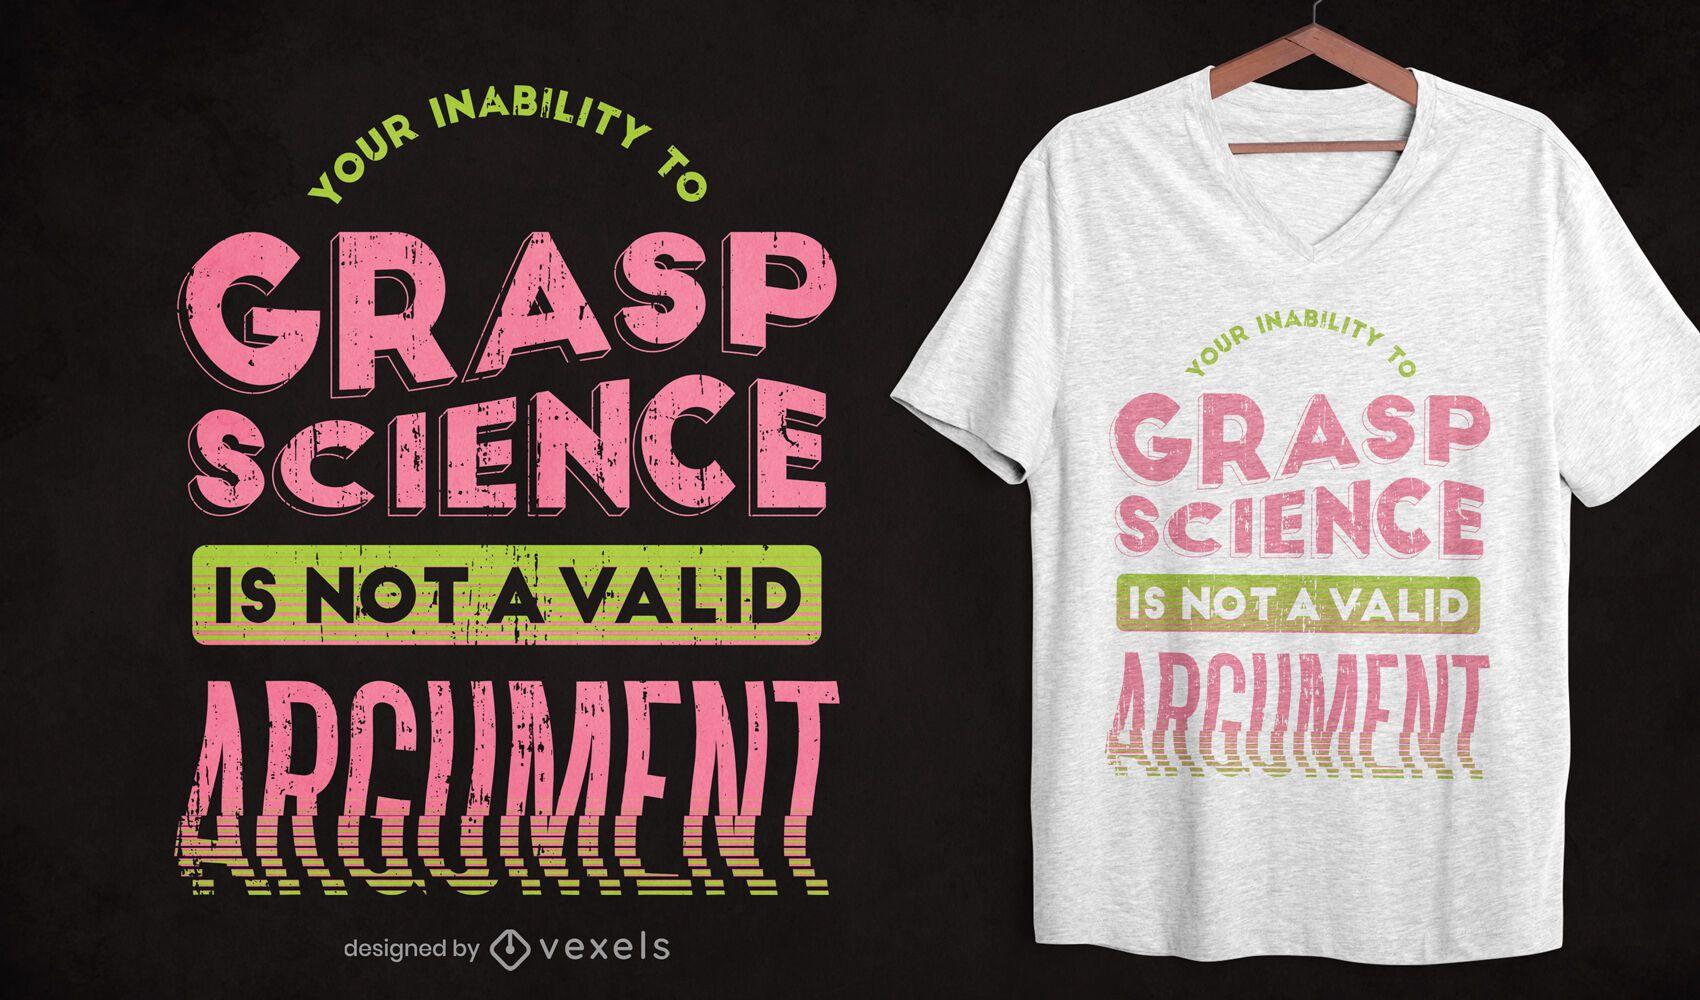 Diseño de camiseta de argumento no válido